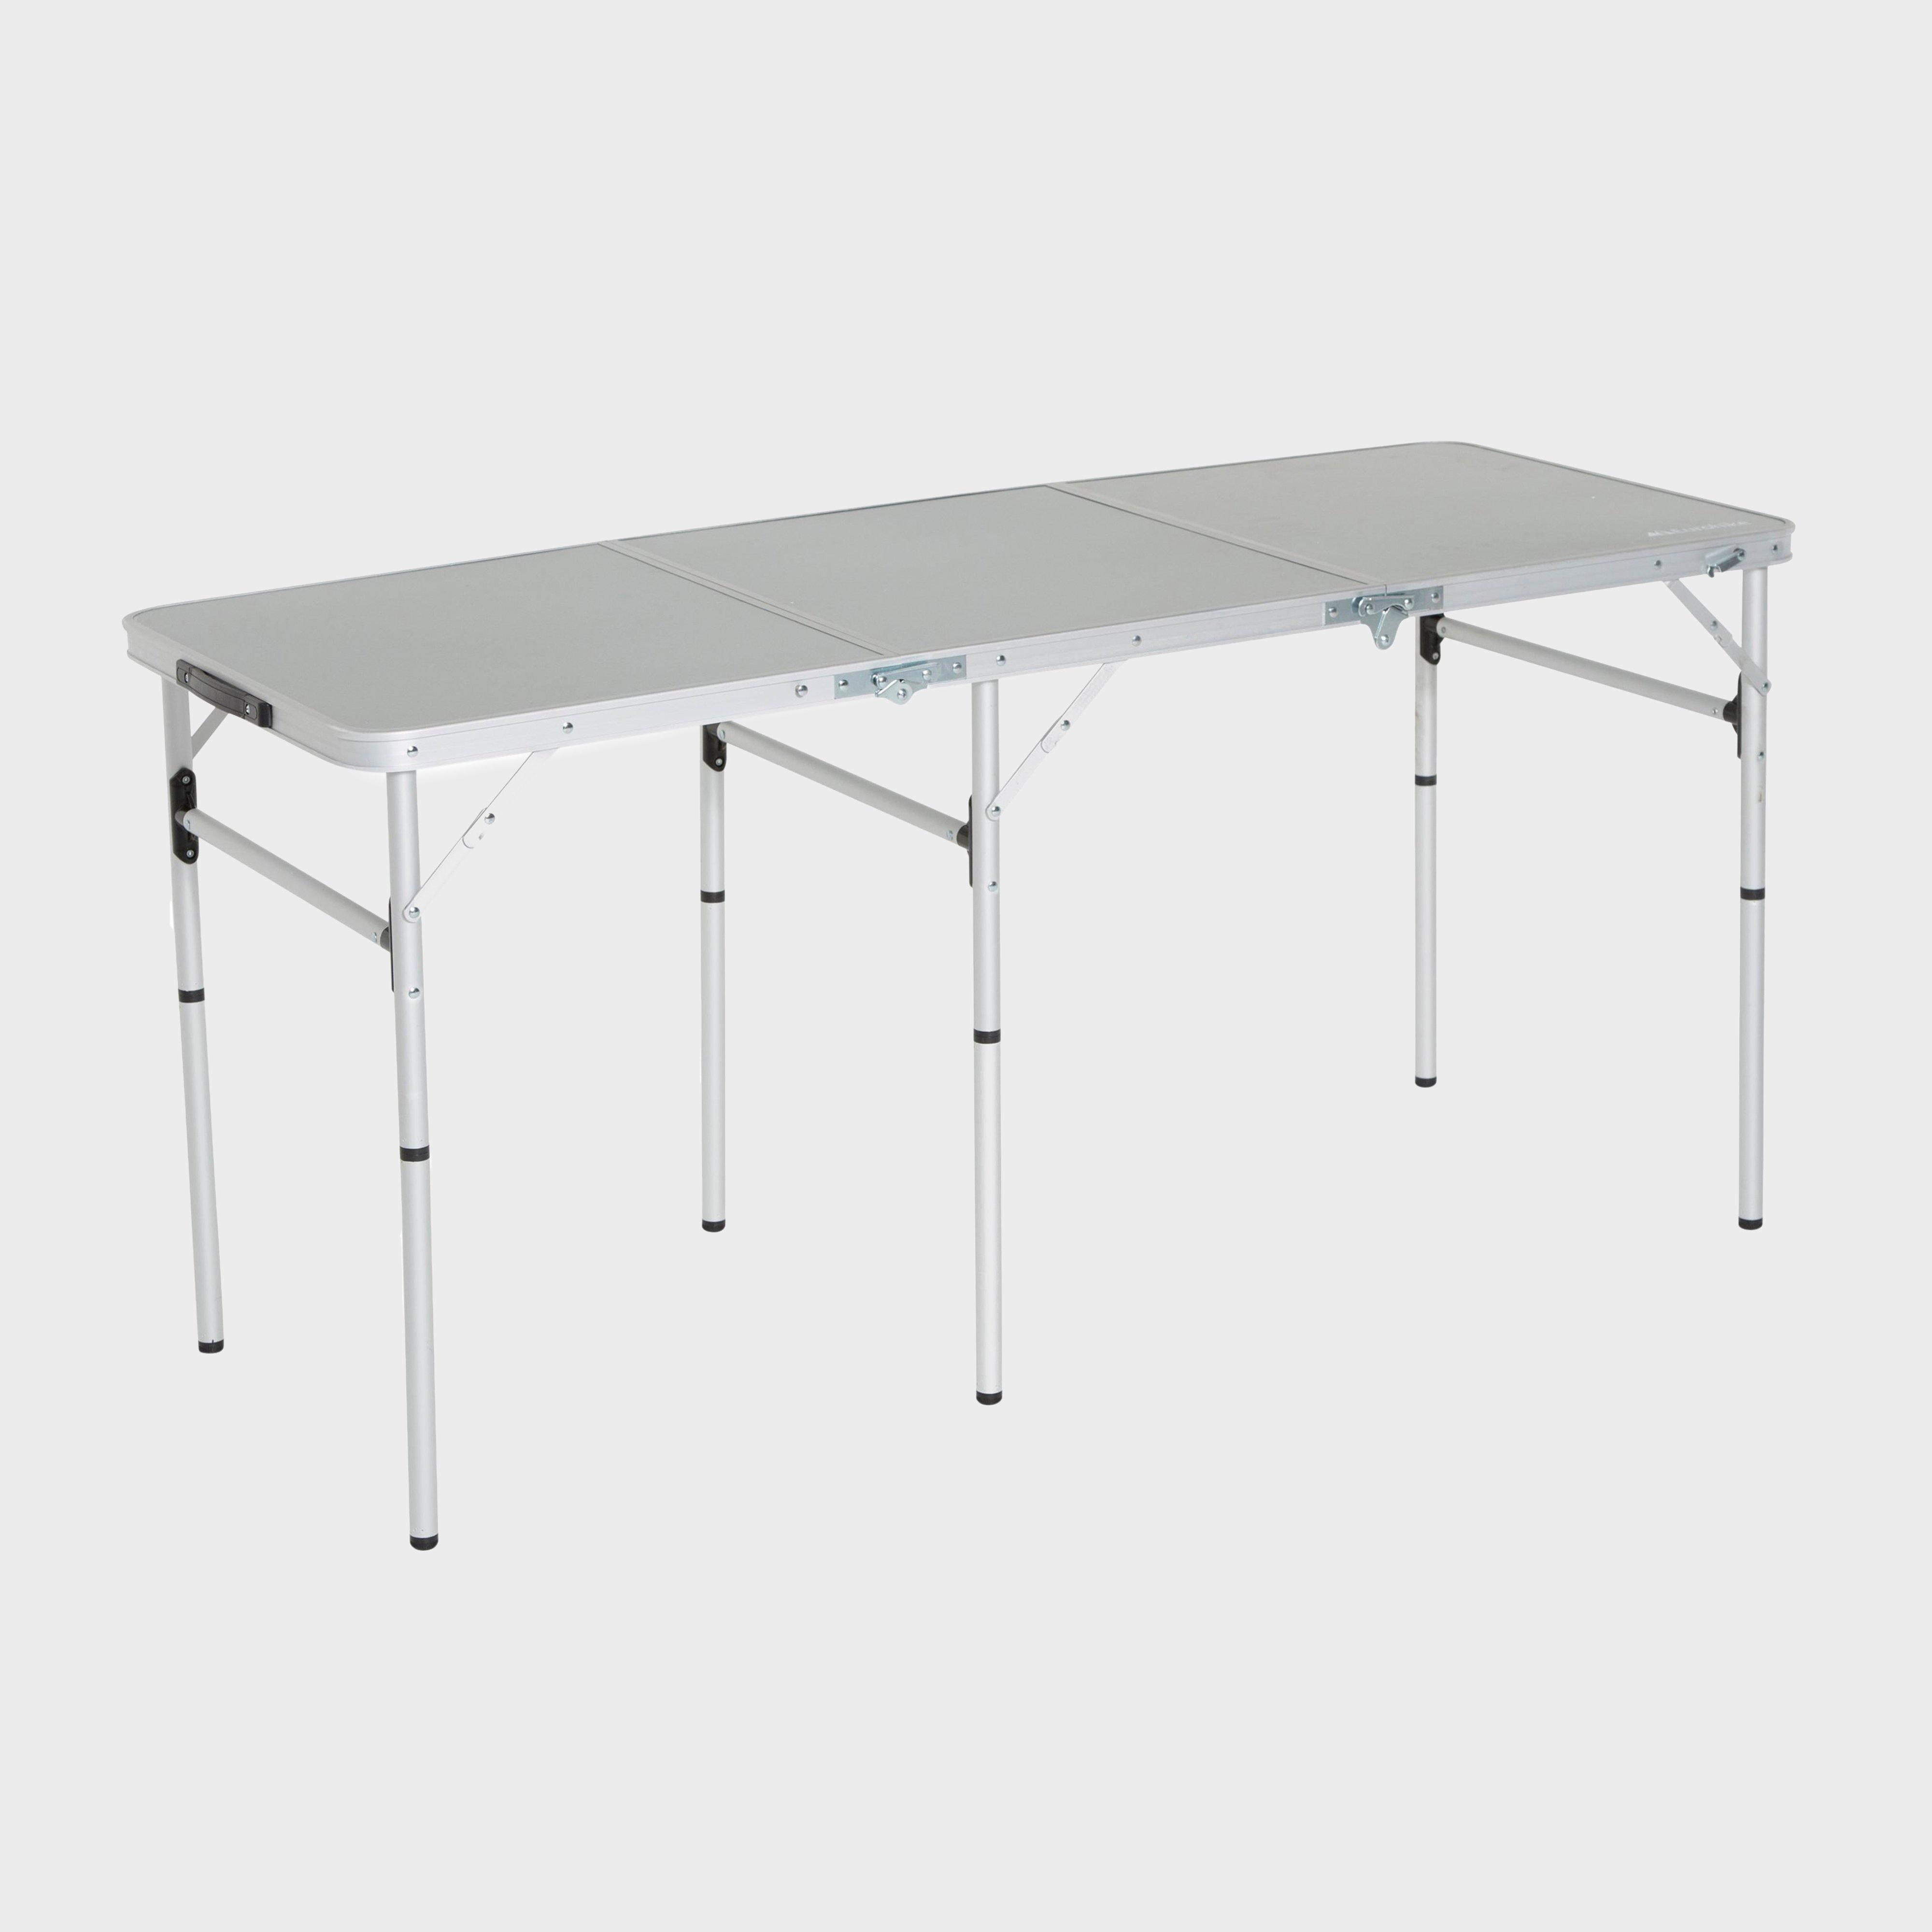 Eurohike Eurohike Triple Table - Silver, Silver